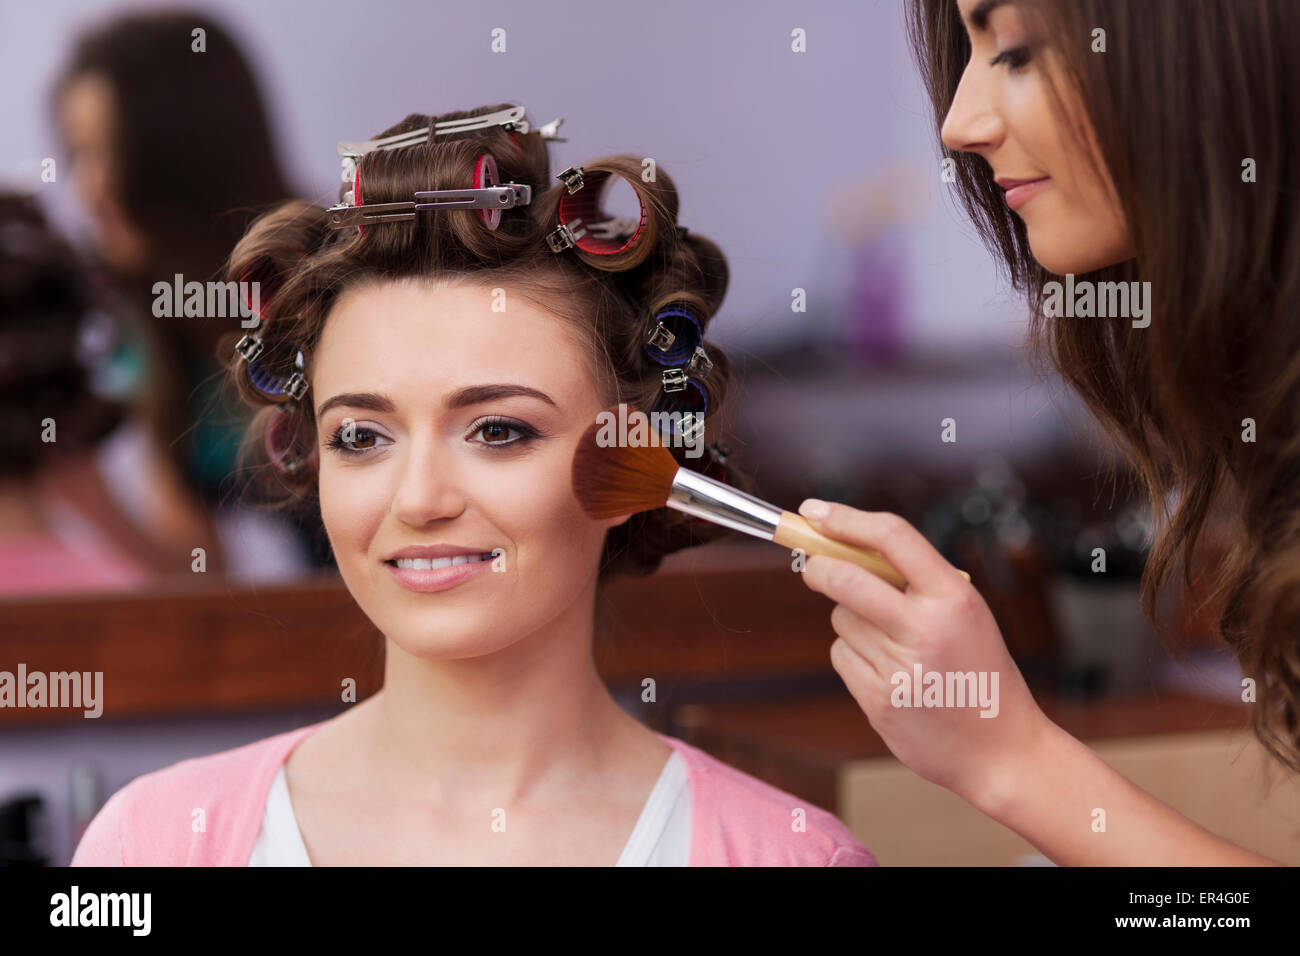 Makeup artist applying makeup by brush. Debica, Poland - Stock Image